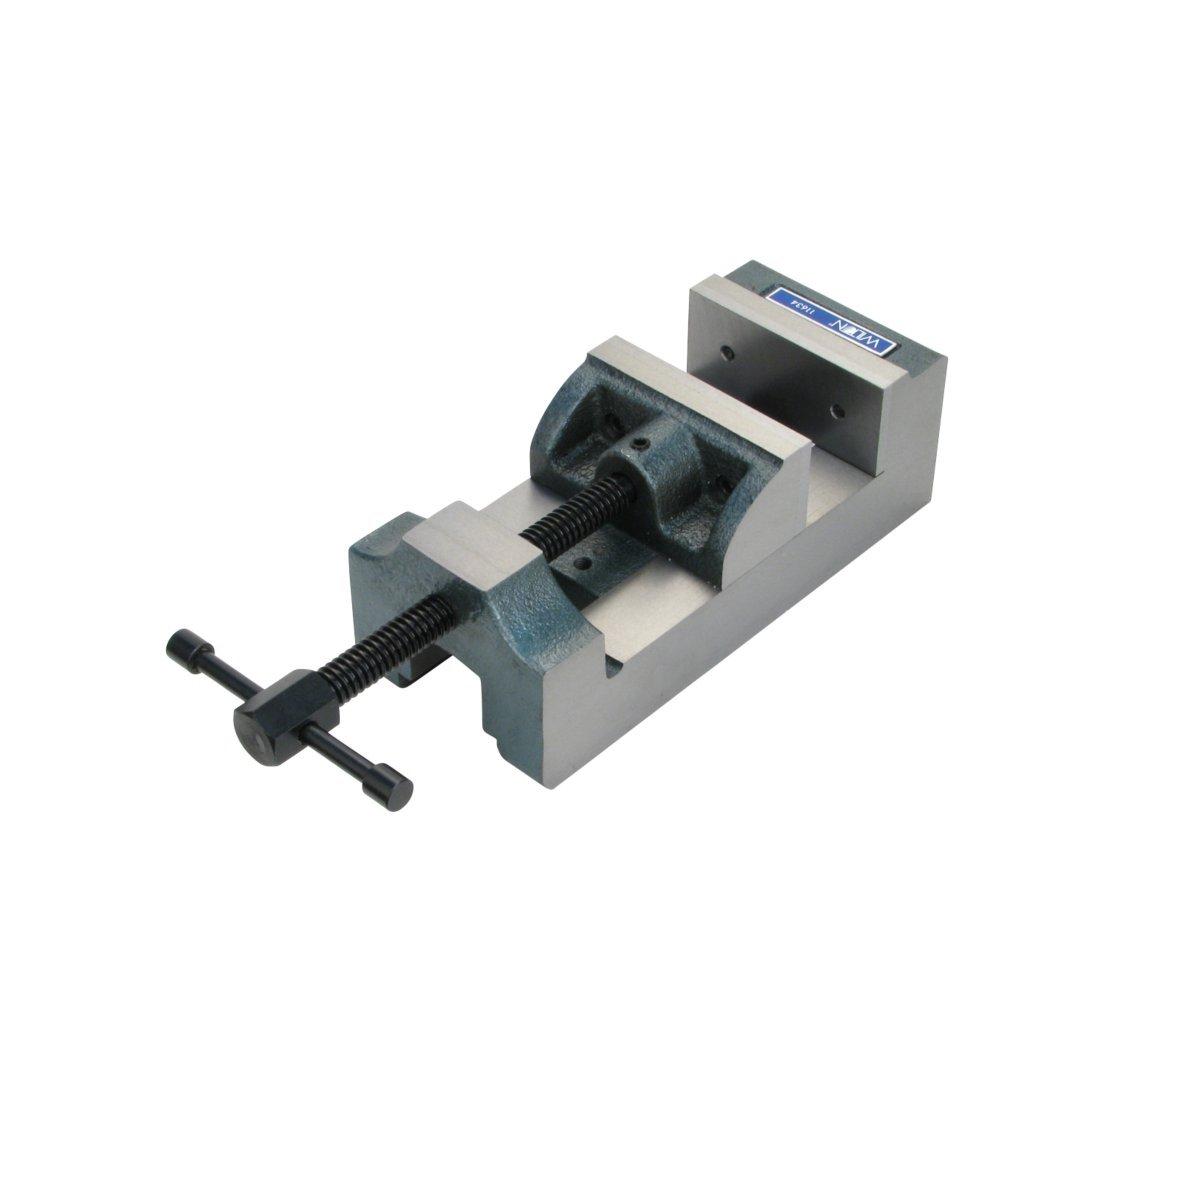 Wilton 11634 4-Inch Ground Drill Press Vise by WILTON